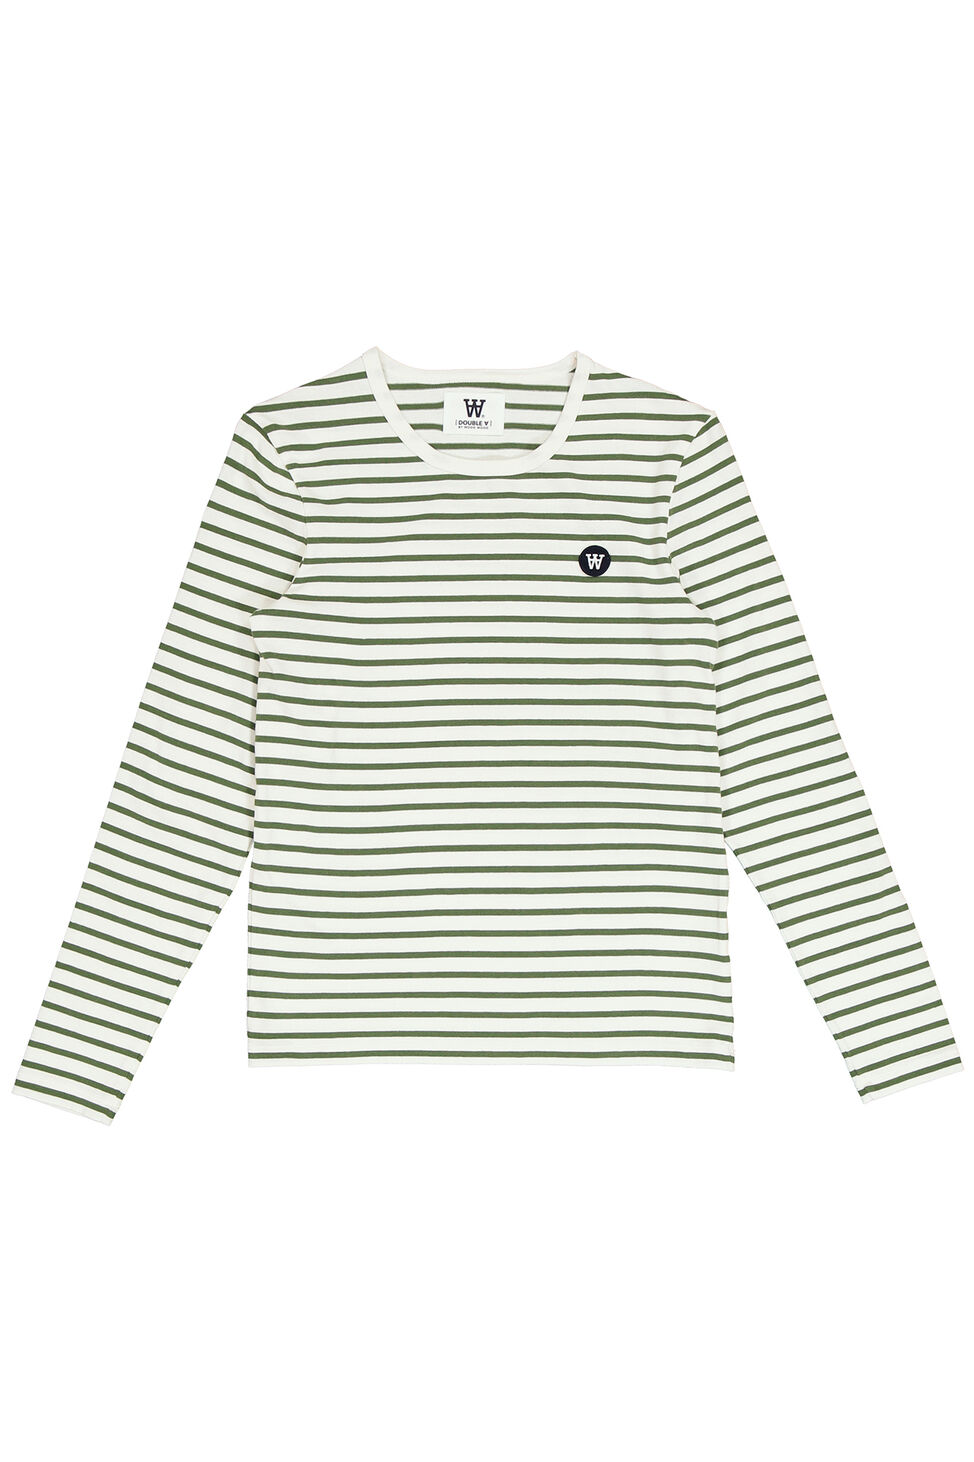 Moa long sleeve 10911501-2323, OFF-WHITE/GREEN STRIPES